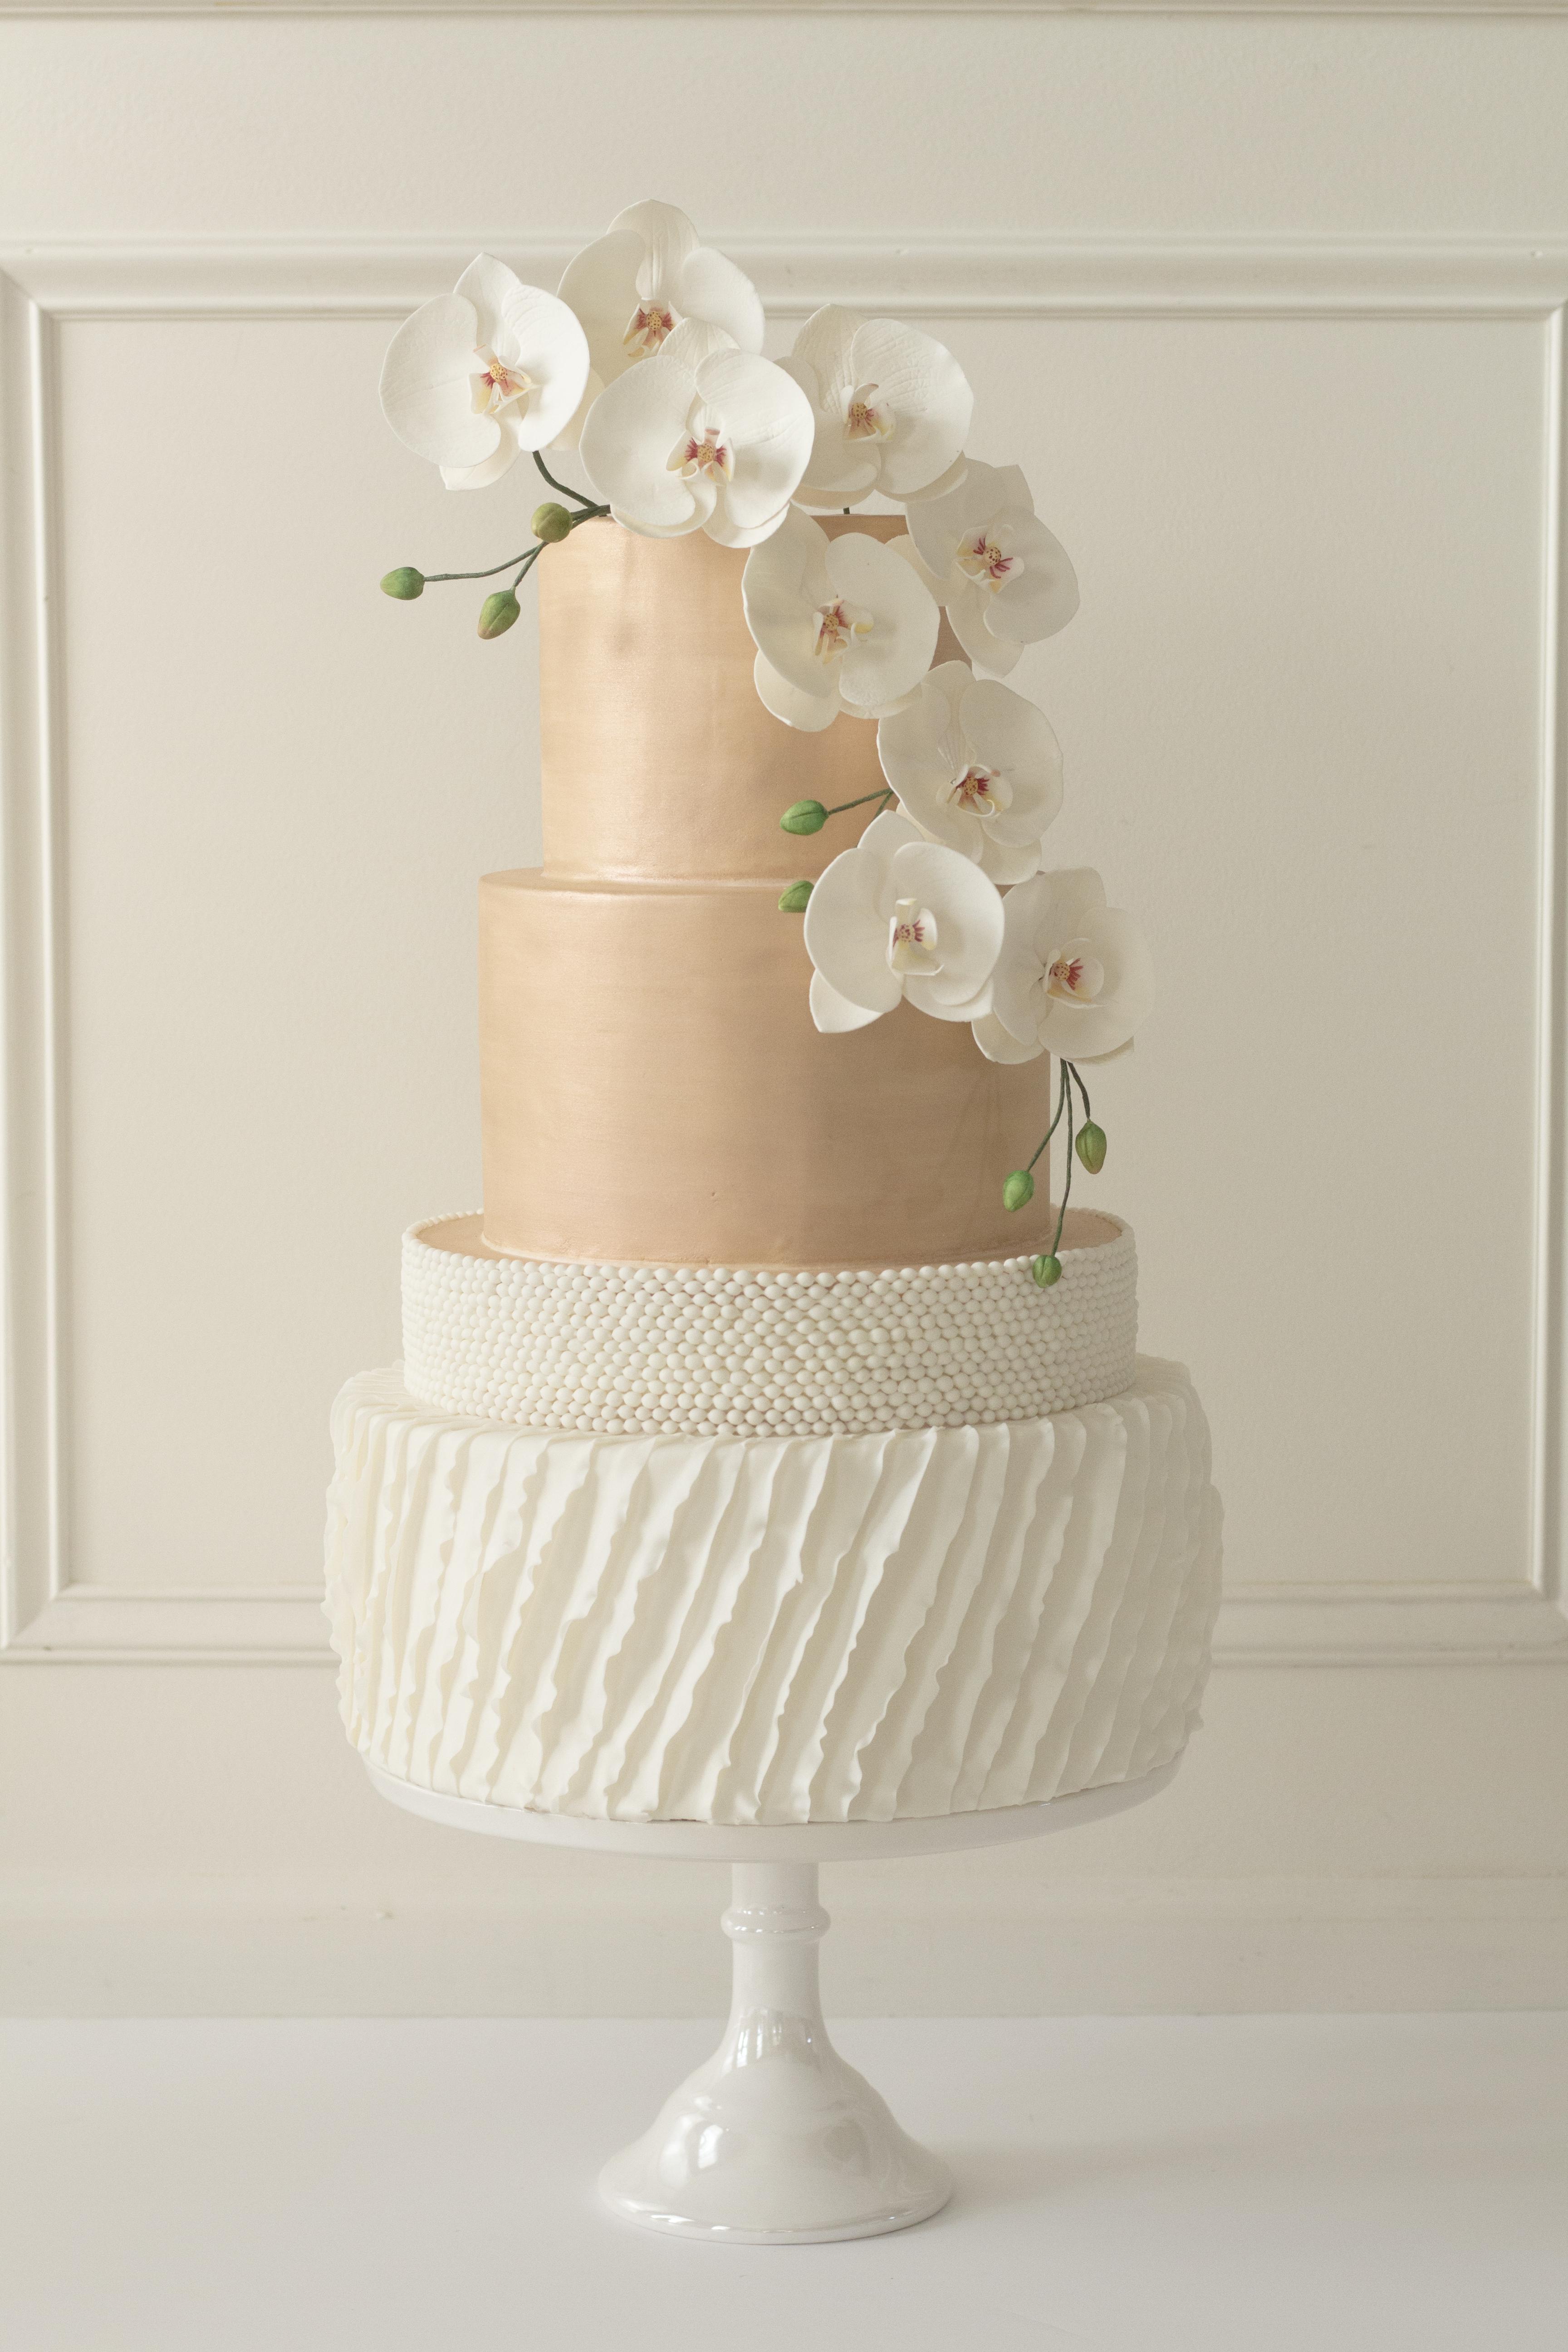 Peach and white wedding